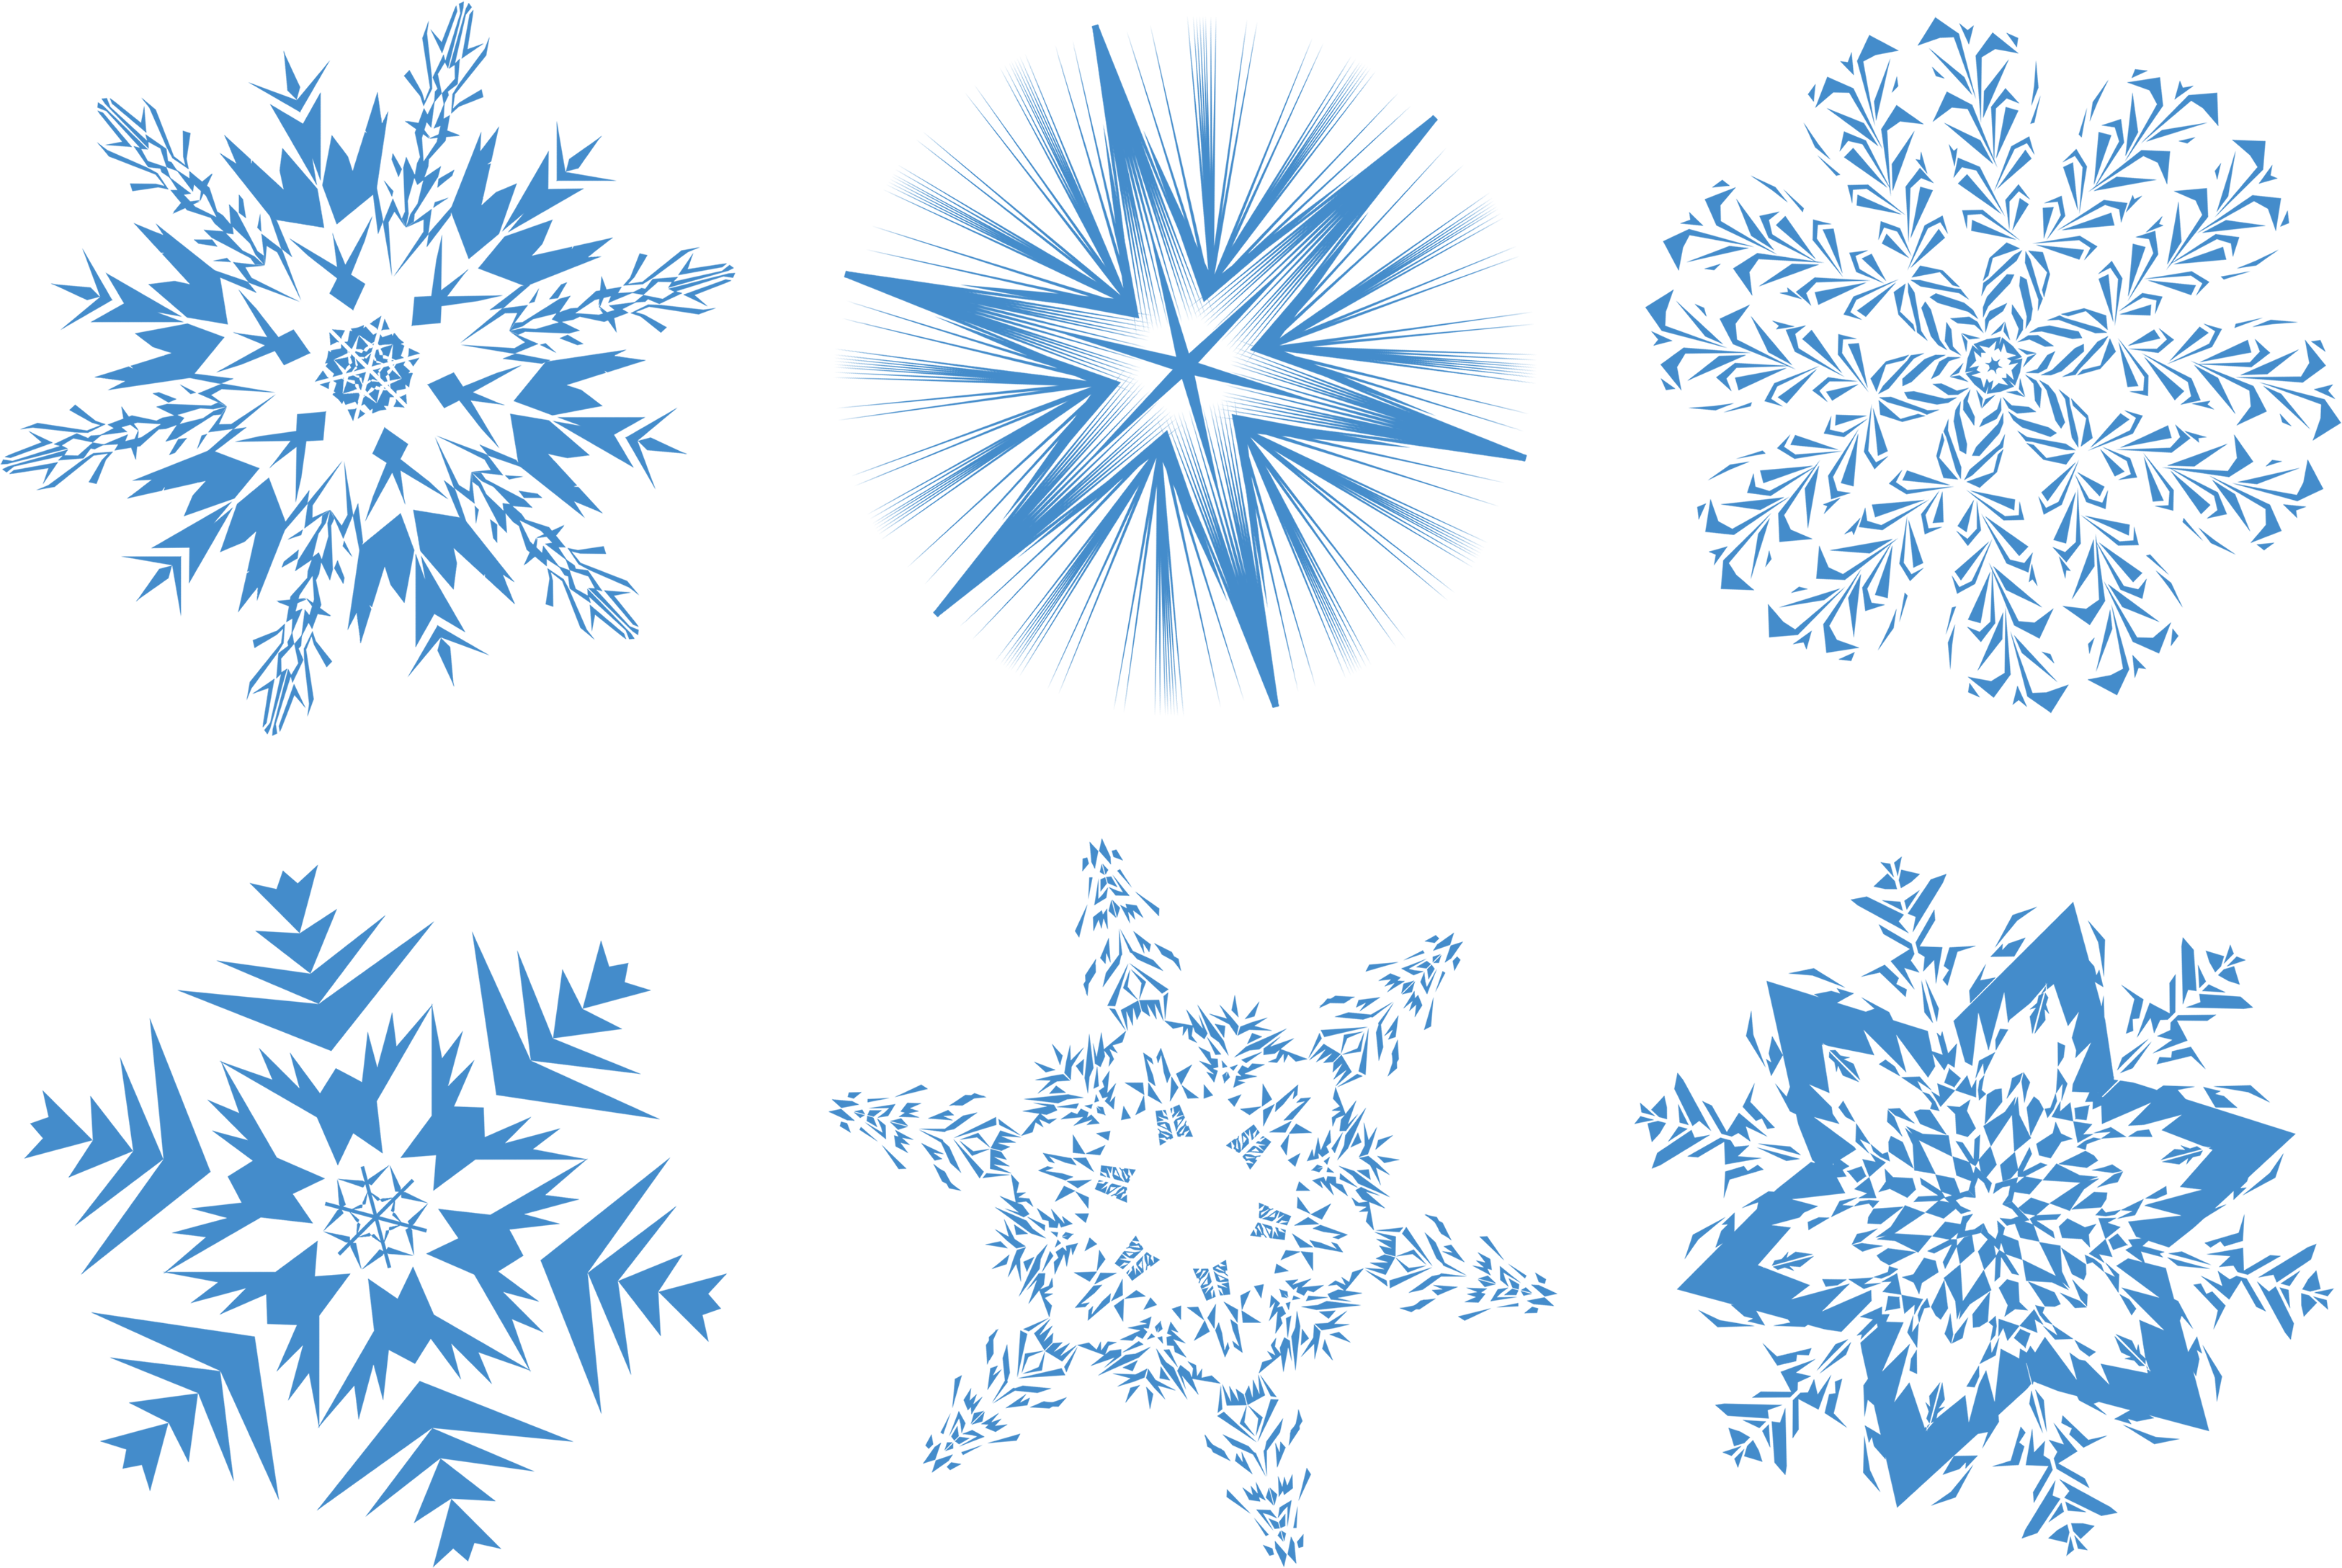 Snowflakes PNG Image - PurePNG | Free transparent CC0 PNG ...